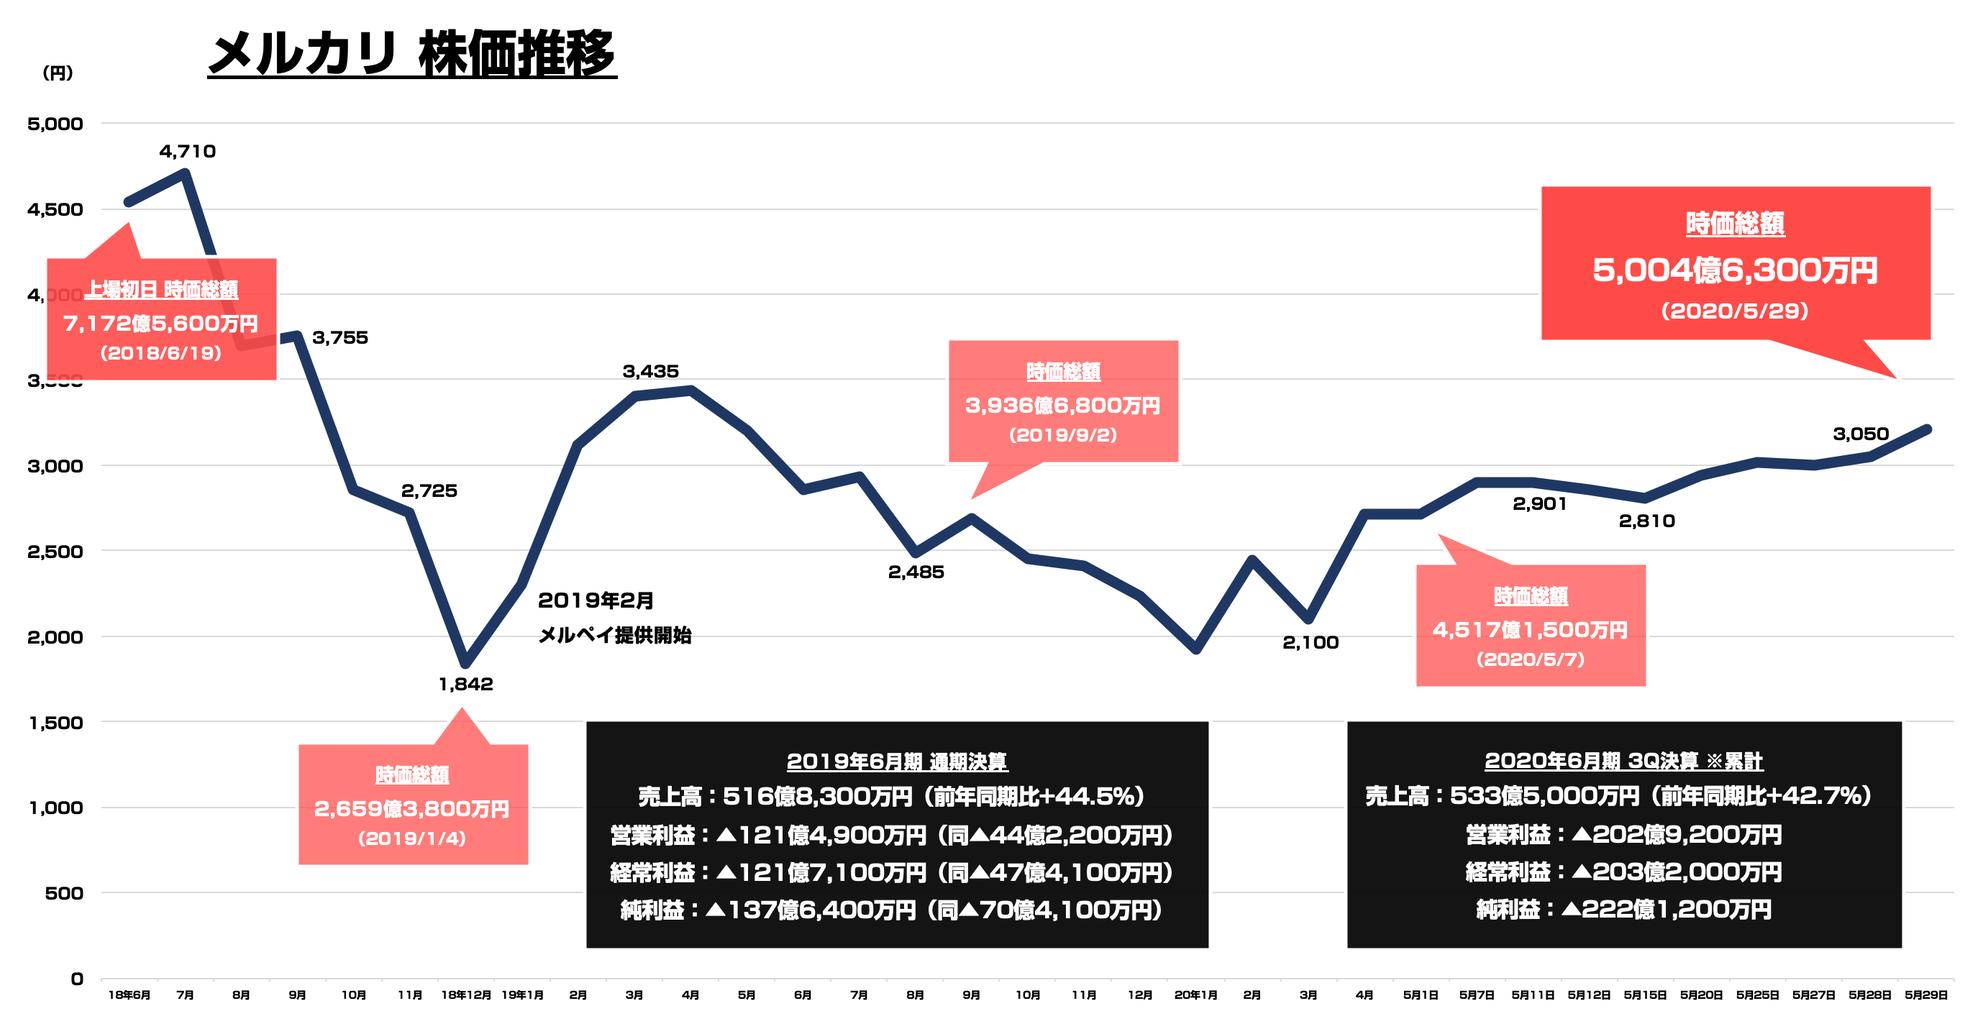 株価 ebay [EBAY]イーベイ 企業概要・株価・配当金・利回り・増配状況